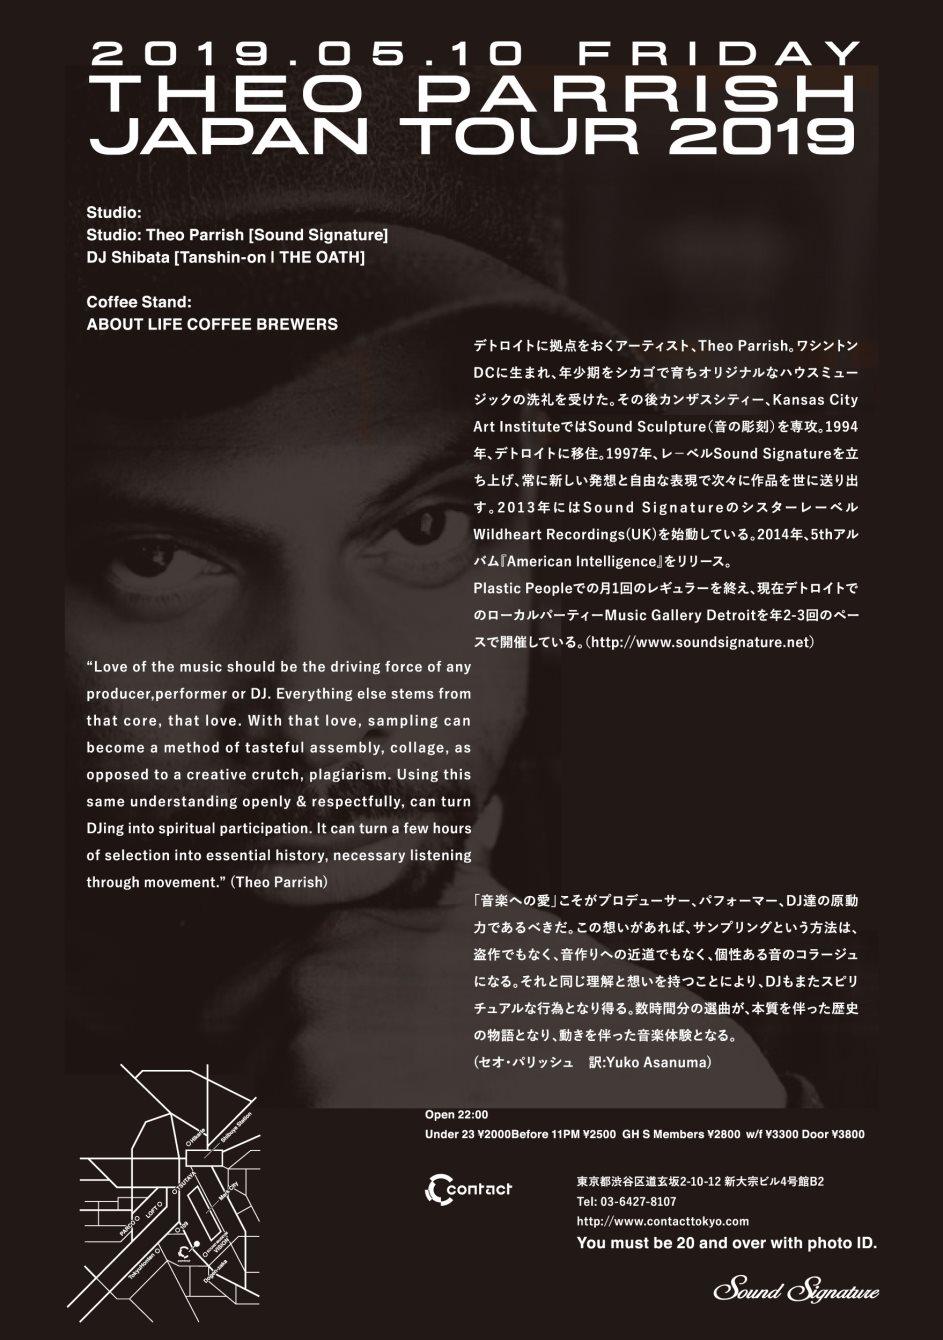 Theo Parrish Japan Tour 2019 - Flyer back